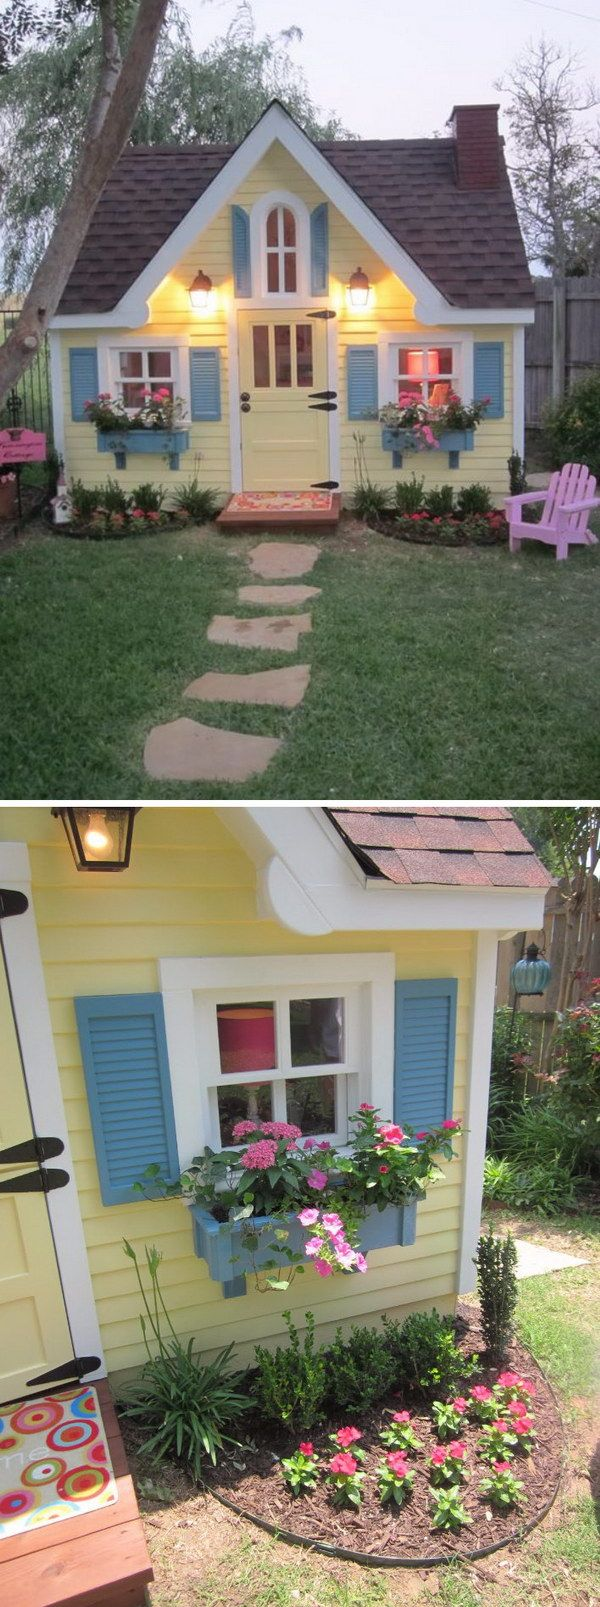 Best 25+ Outside playhouse ideas on Pinterest